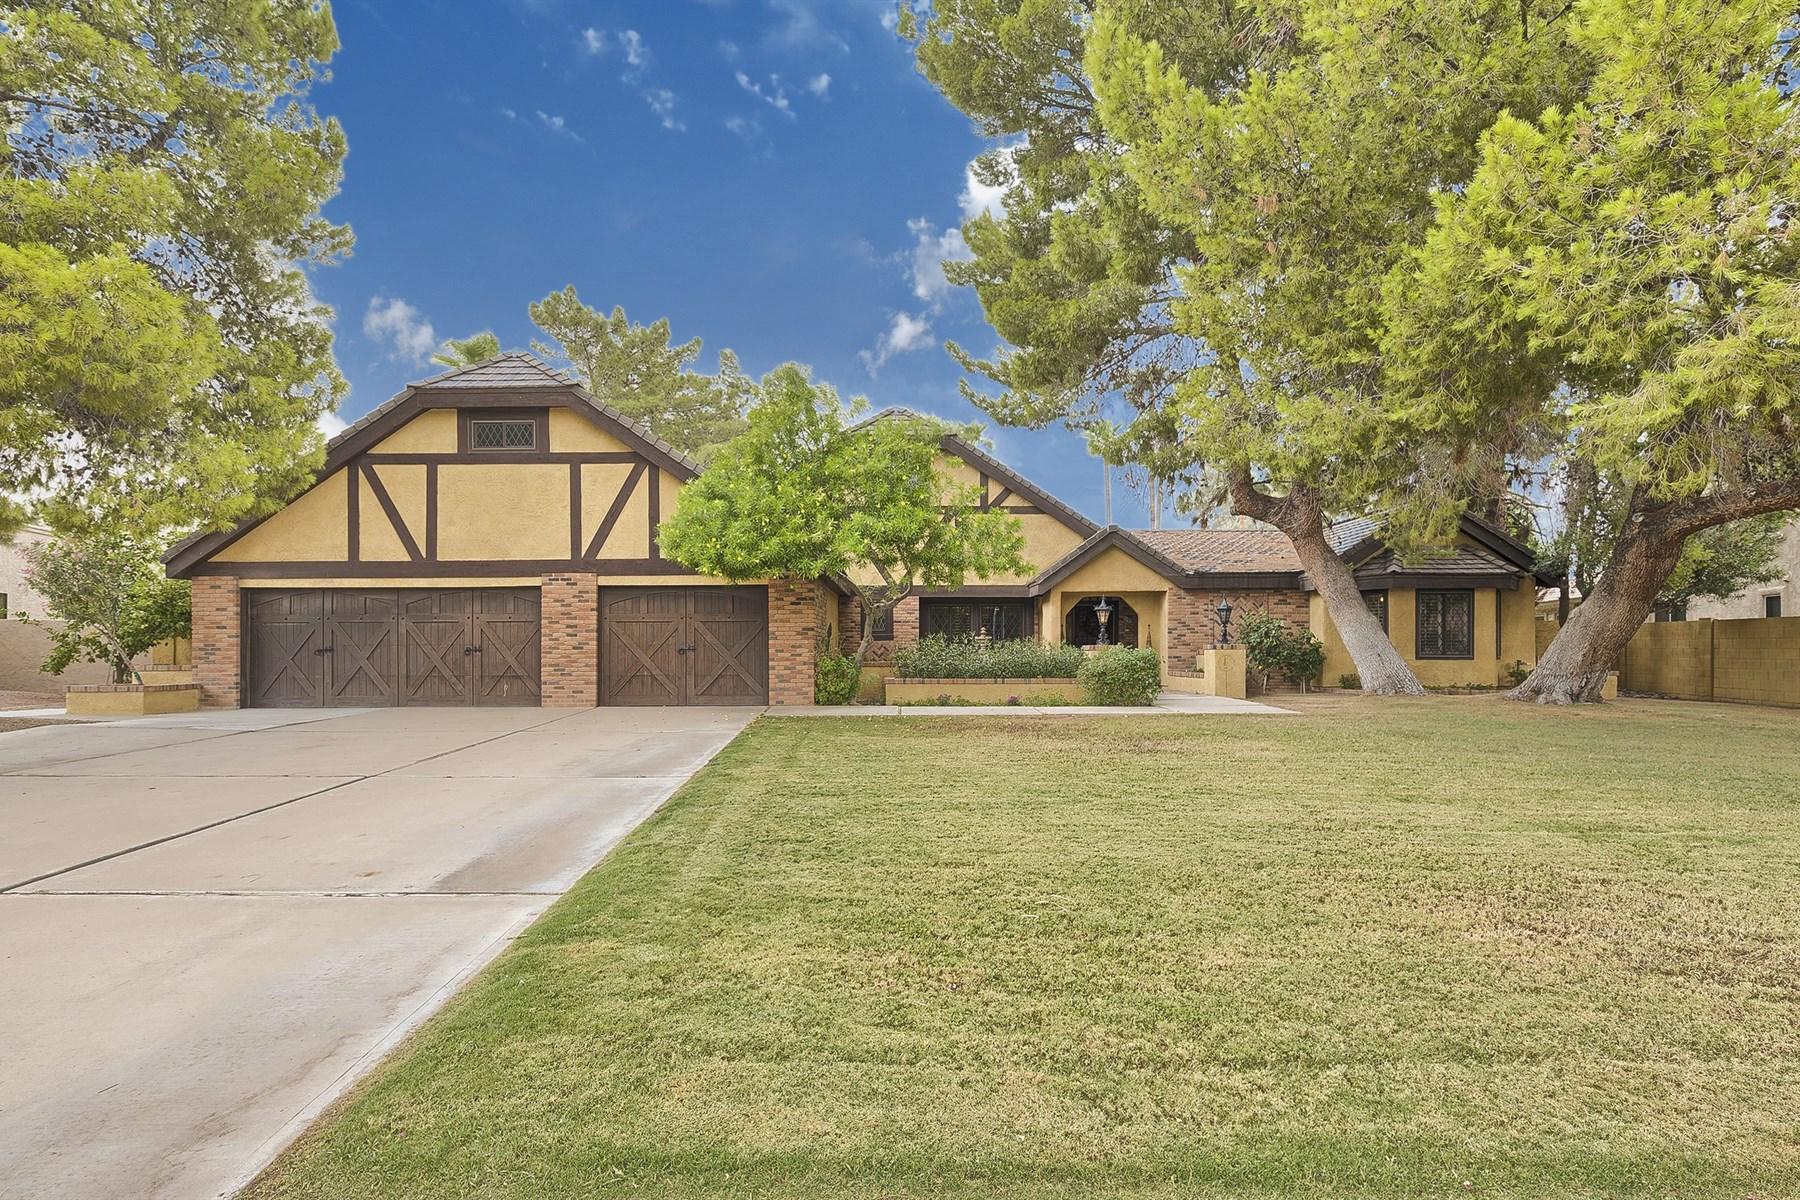 Moradia para Venda às Home with Character, Charm & Comfortable Elegance. 3904 E Talowa St Phoenix, Arizona 85044 Estados Unidos